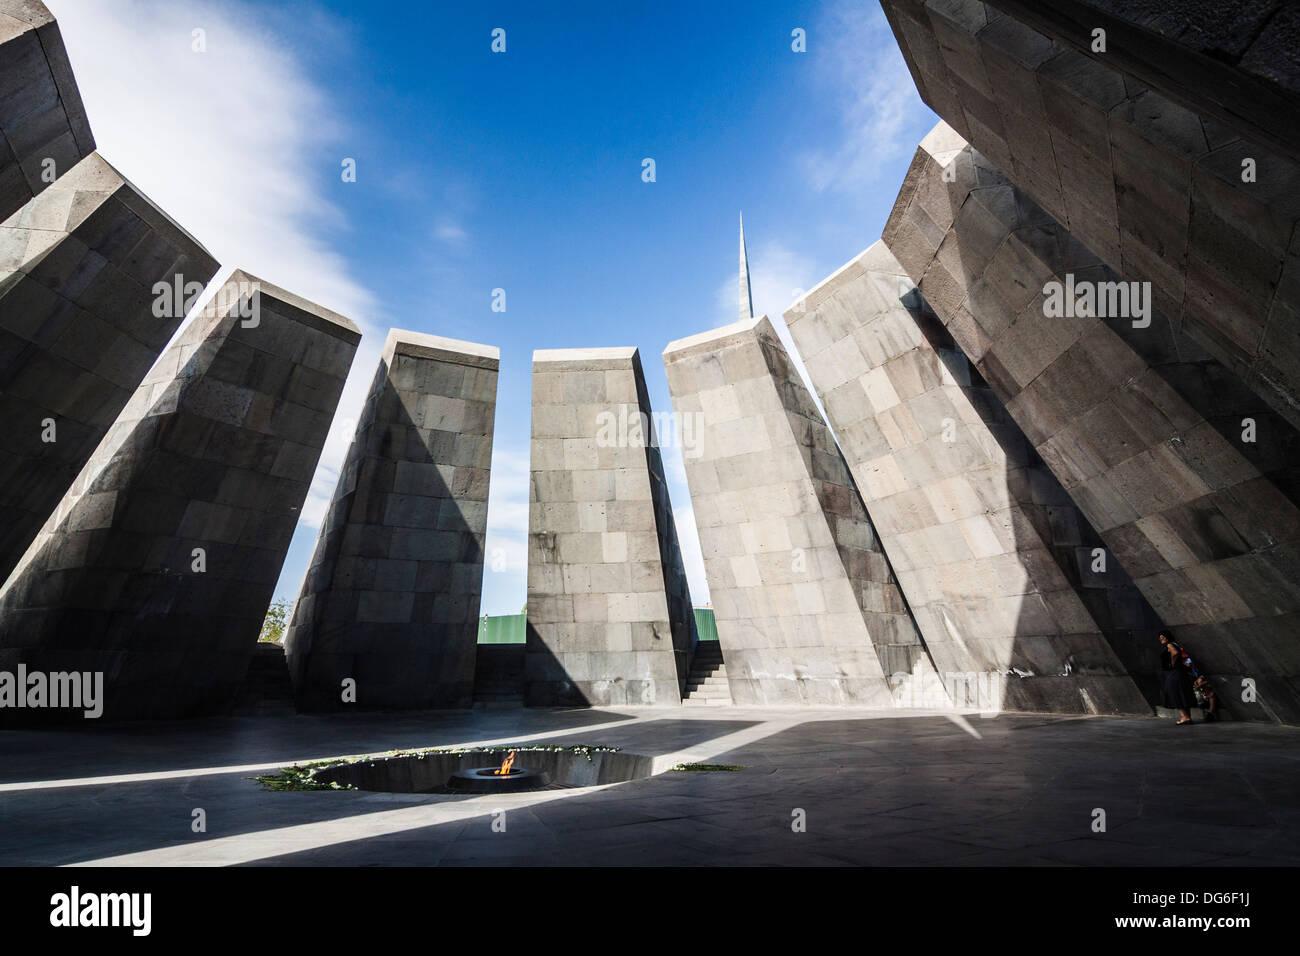 Eternal flame at the Tsitsernakaberd memorial monument of the Armenian Genocide, Yerevan, Armenia - Stock Image